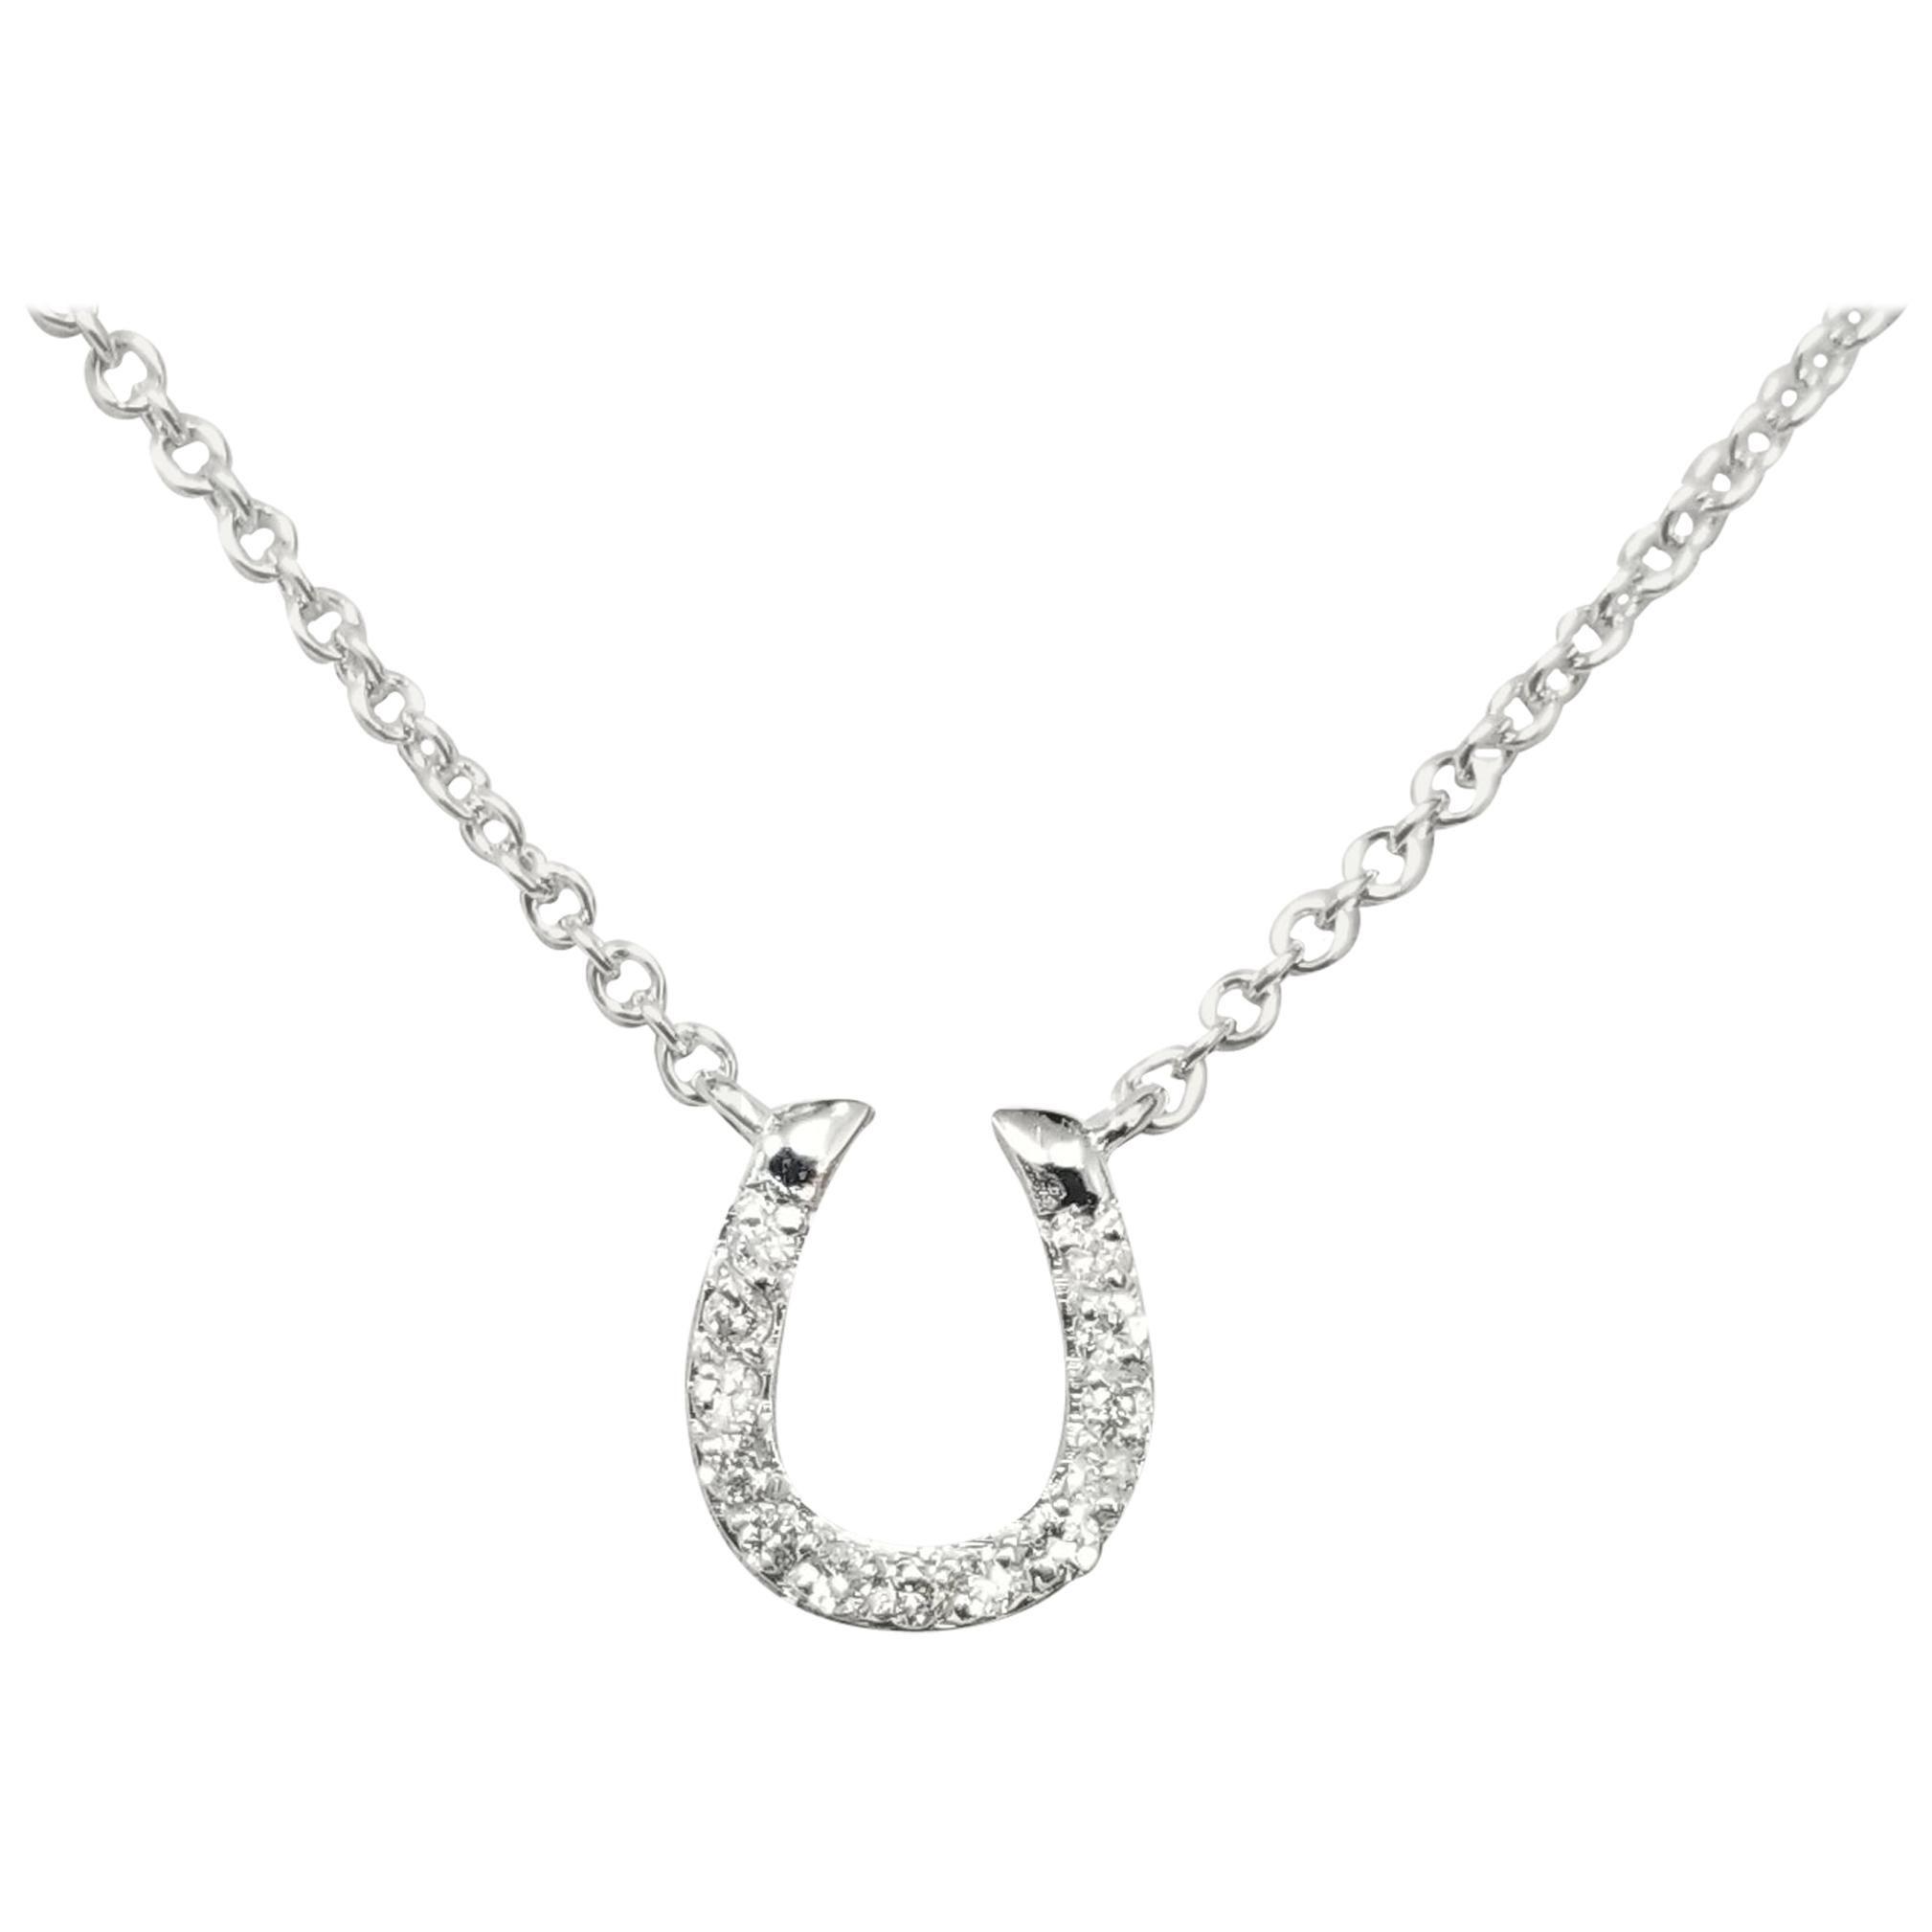 14 Karat White Gold Diamond Horse Shoe Necklace